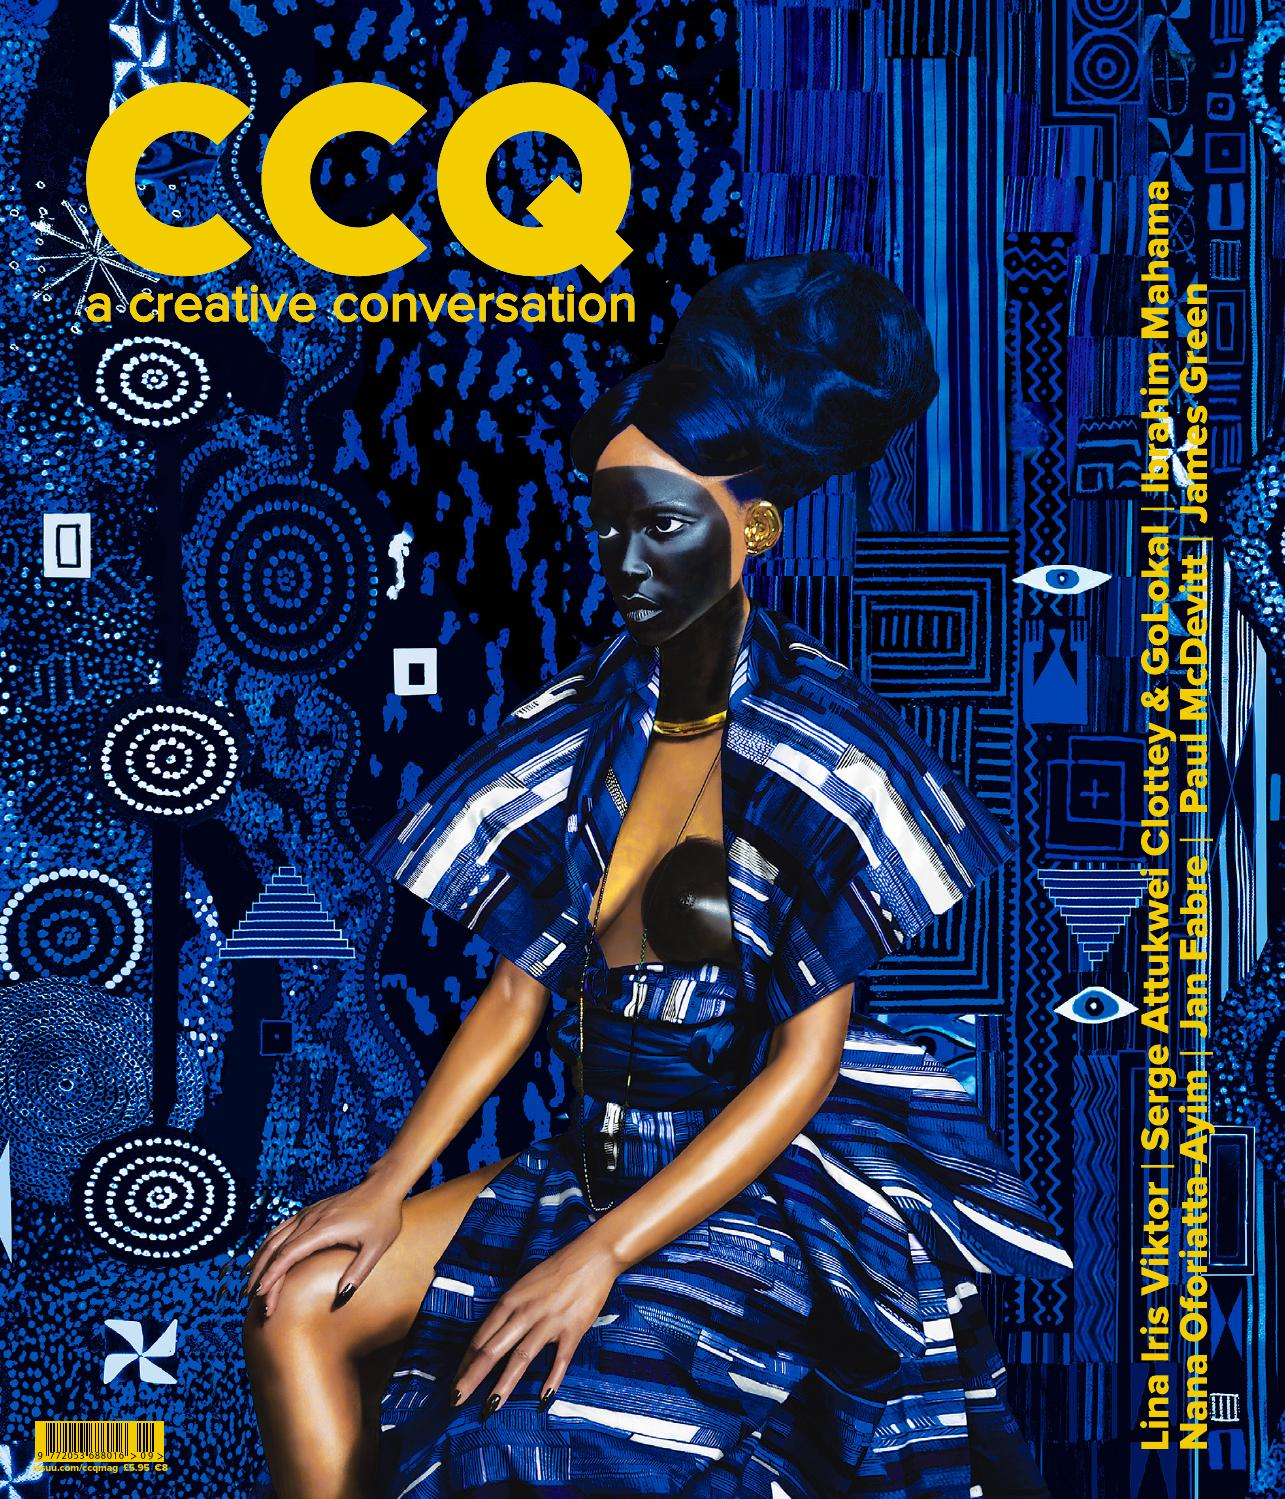 47f780db5 CCQ magazine issue 9 by CCQ magazine - issuu